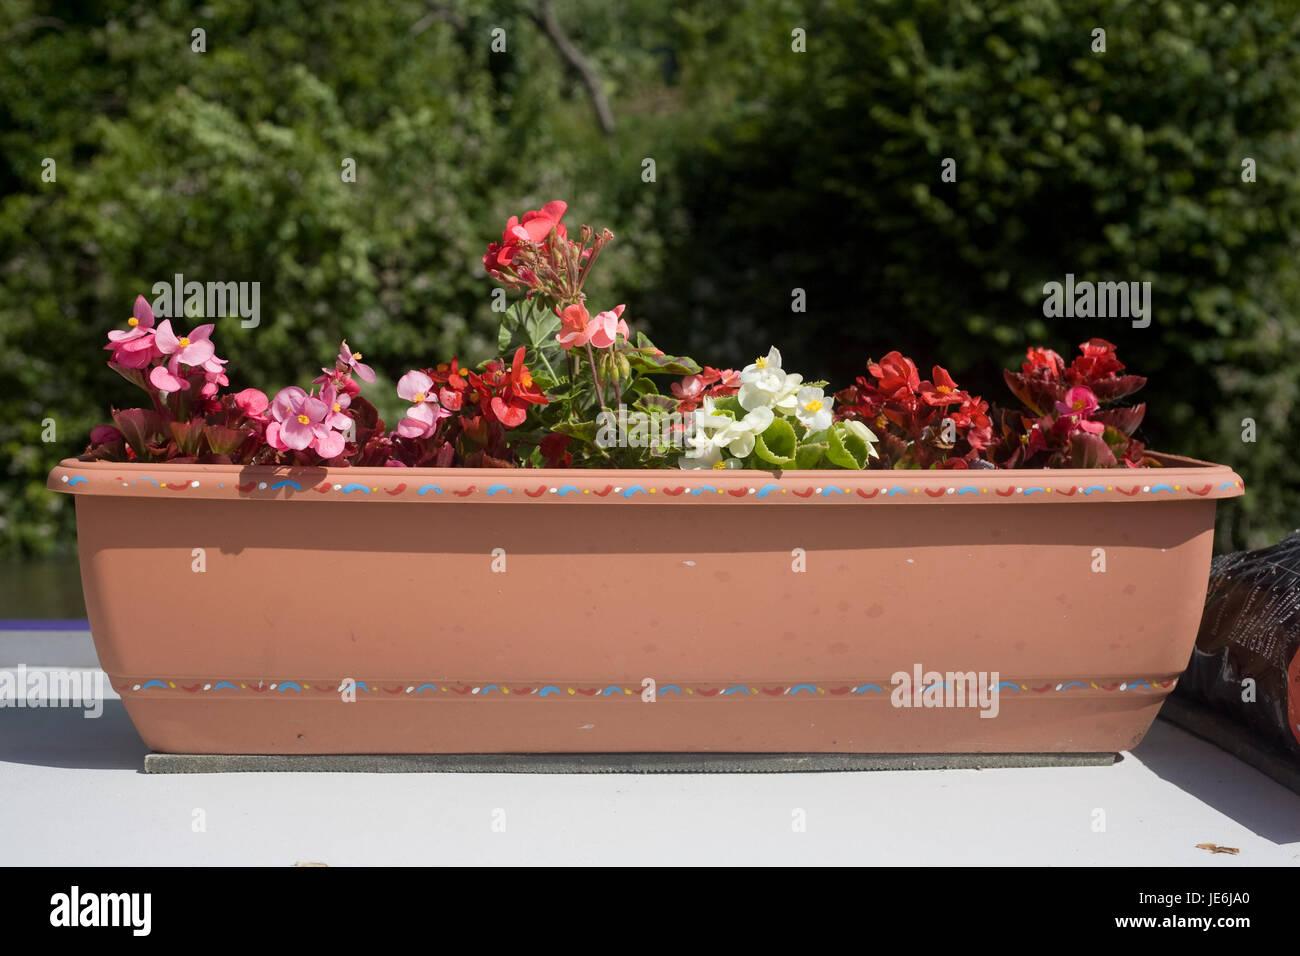 Flower Tub Stock Photos & Flower Tub Stock Images - Alamy